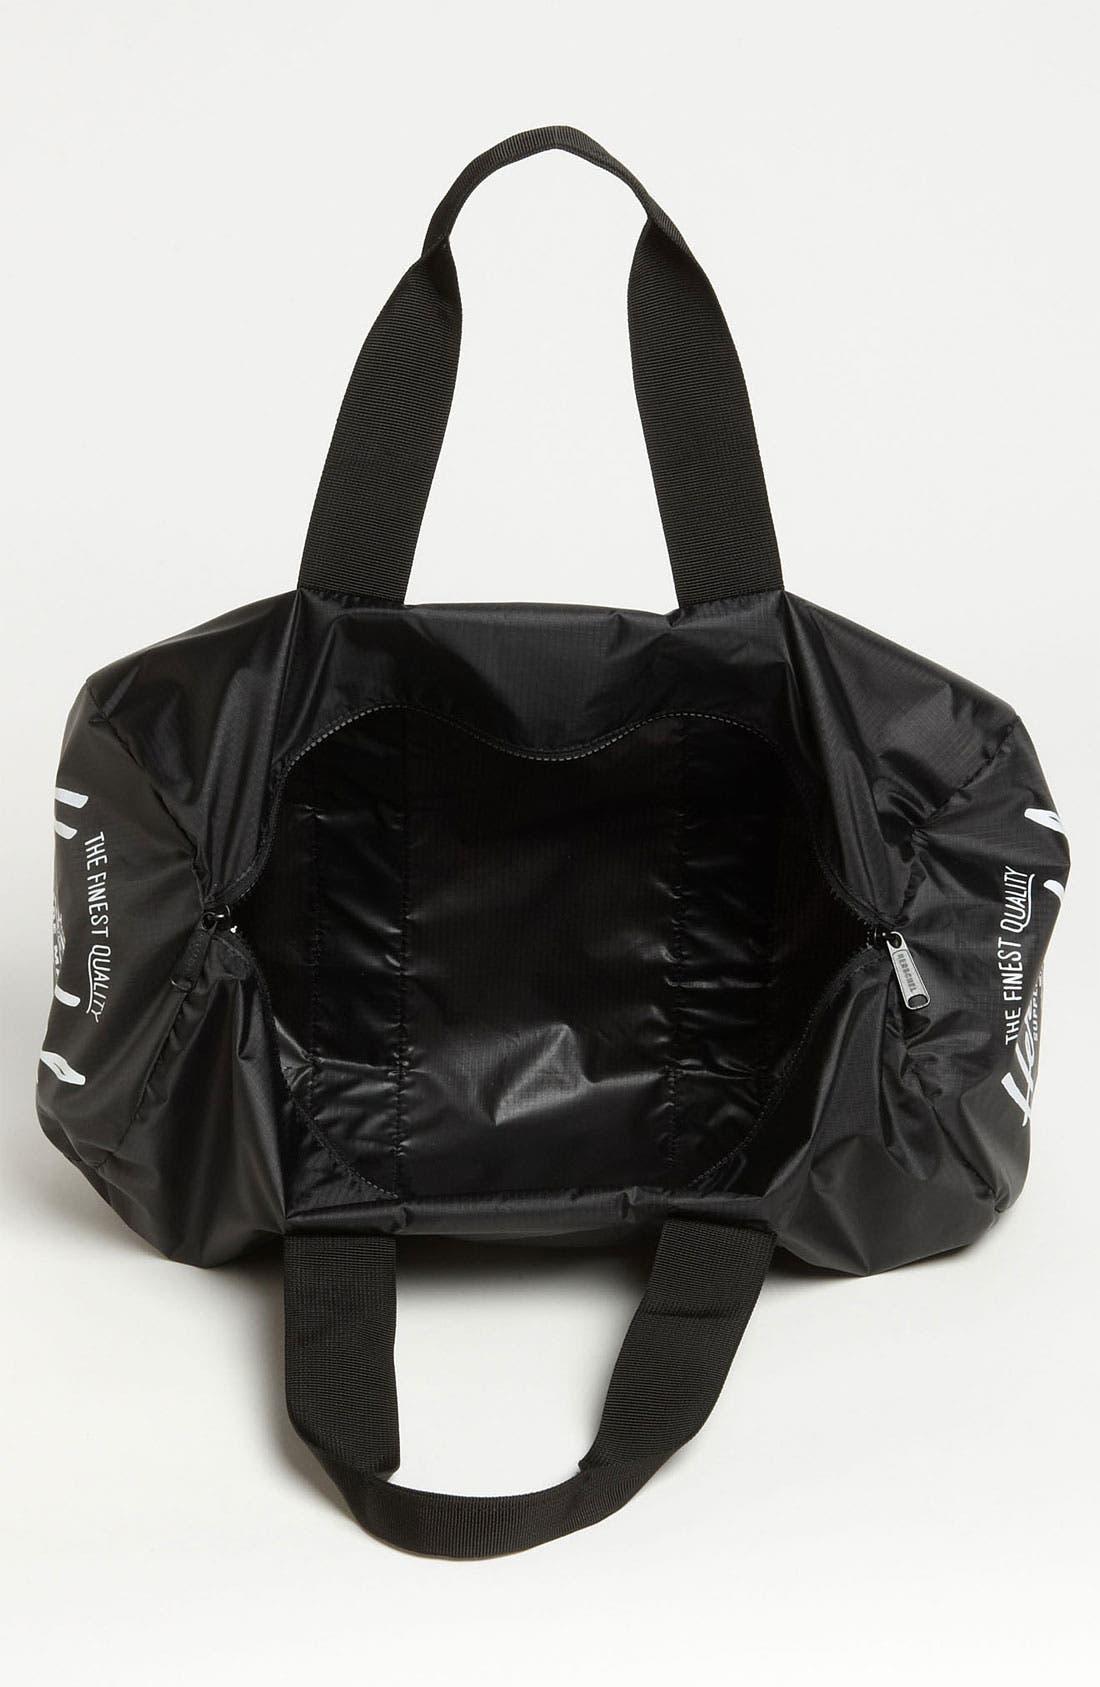 Alternate Image 3  - Herschel Supply Co. 'Packable Collection' Duffel Bag